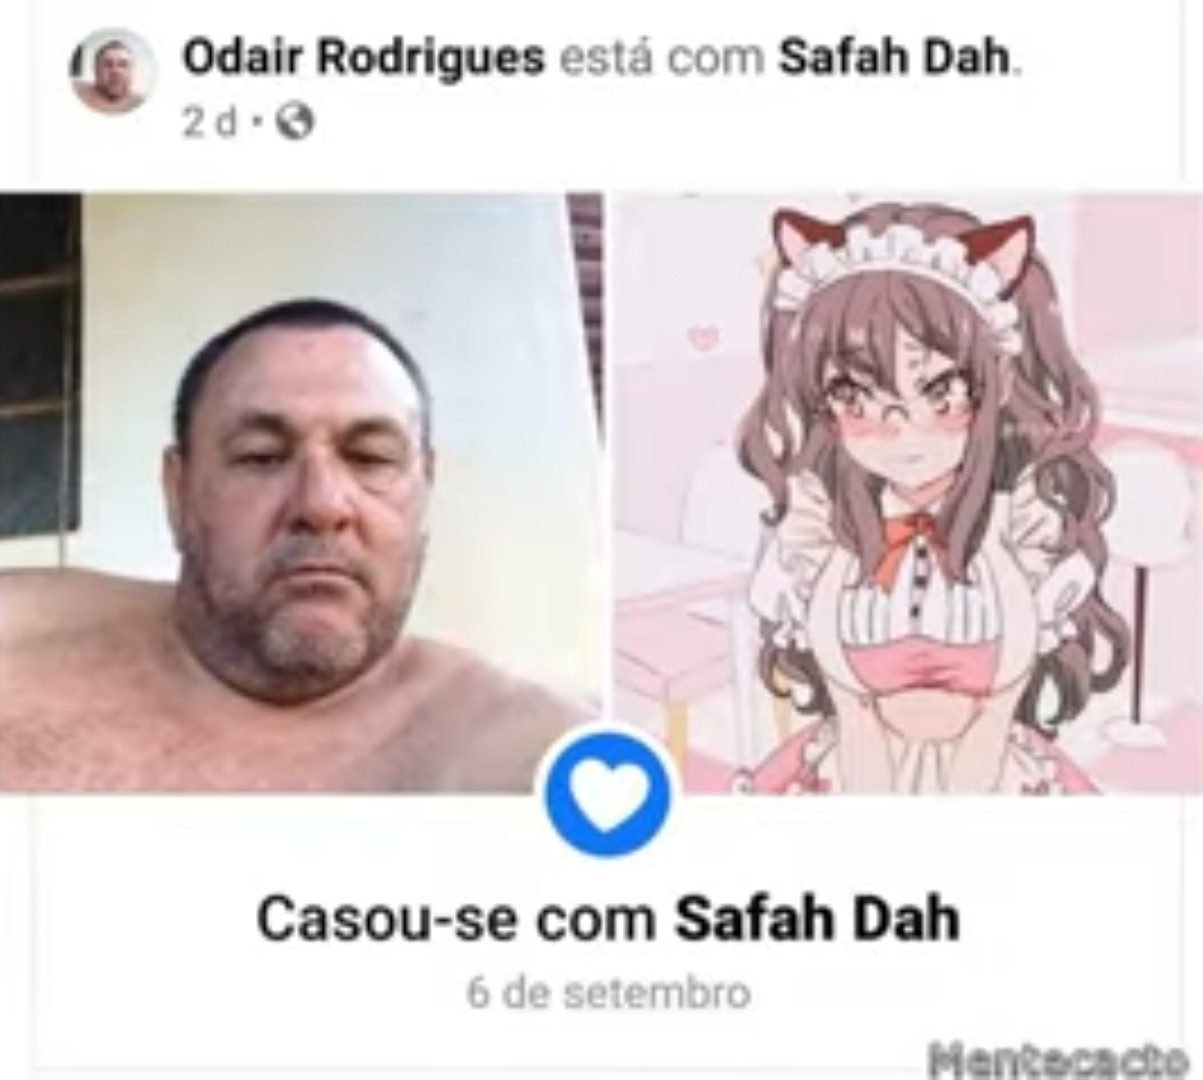 Exposed - meme